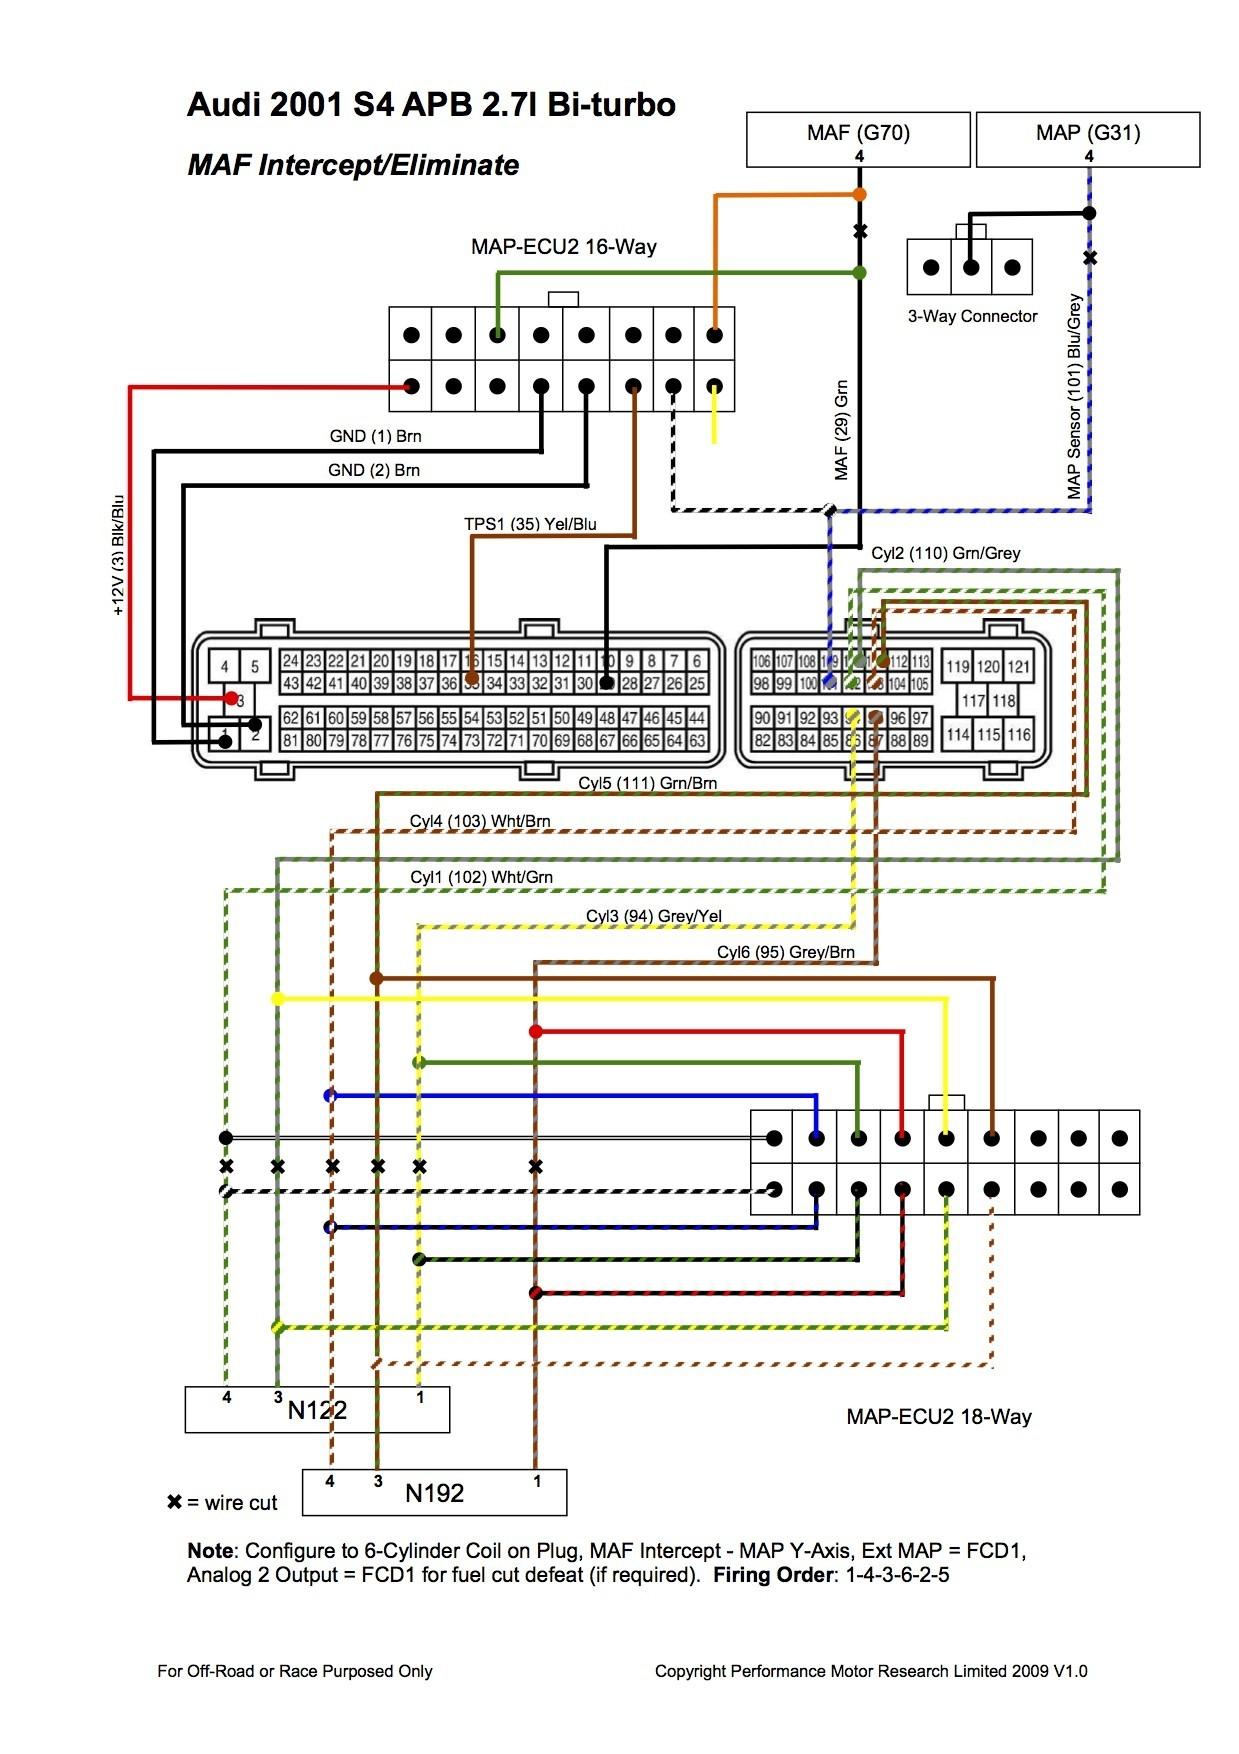 hight resolution of 2002 dodge ram 1500 stereo wiring diagram free wiring diagram dodge ram 1500 club cab 2002